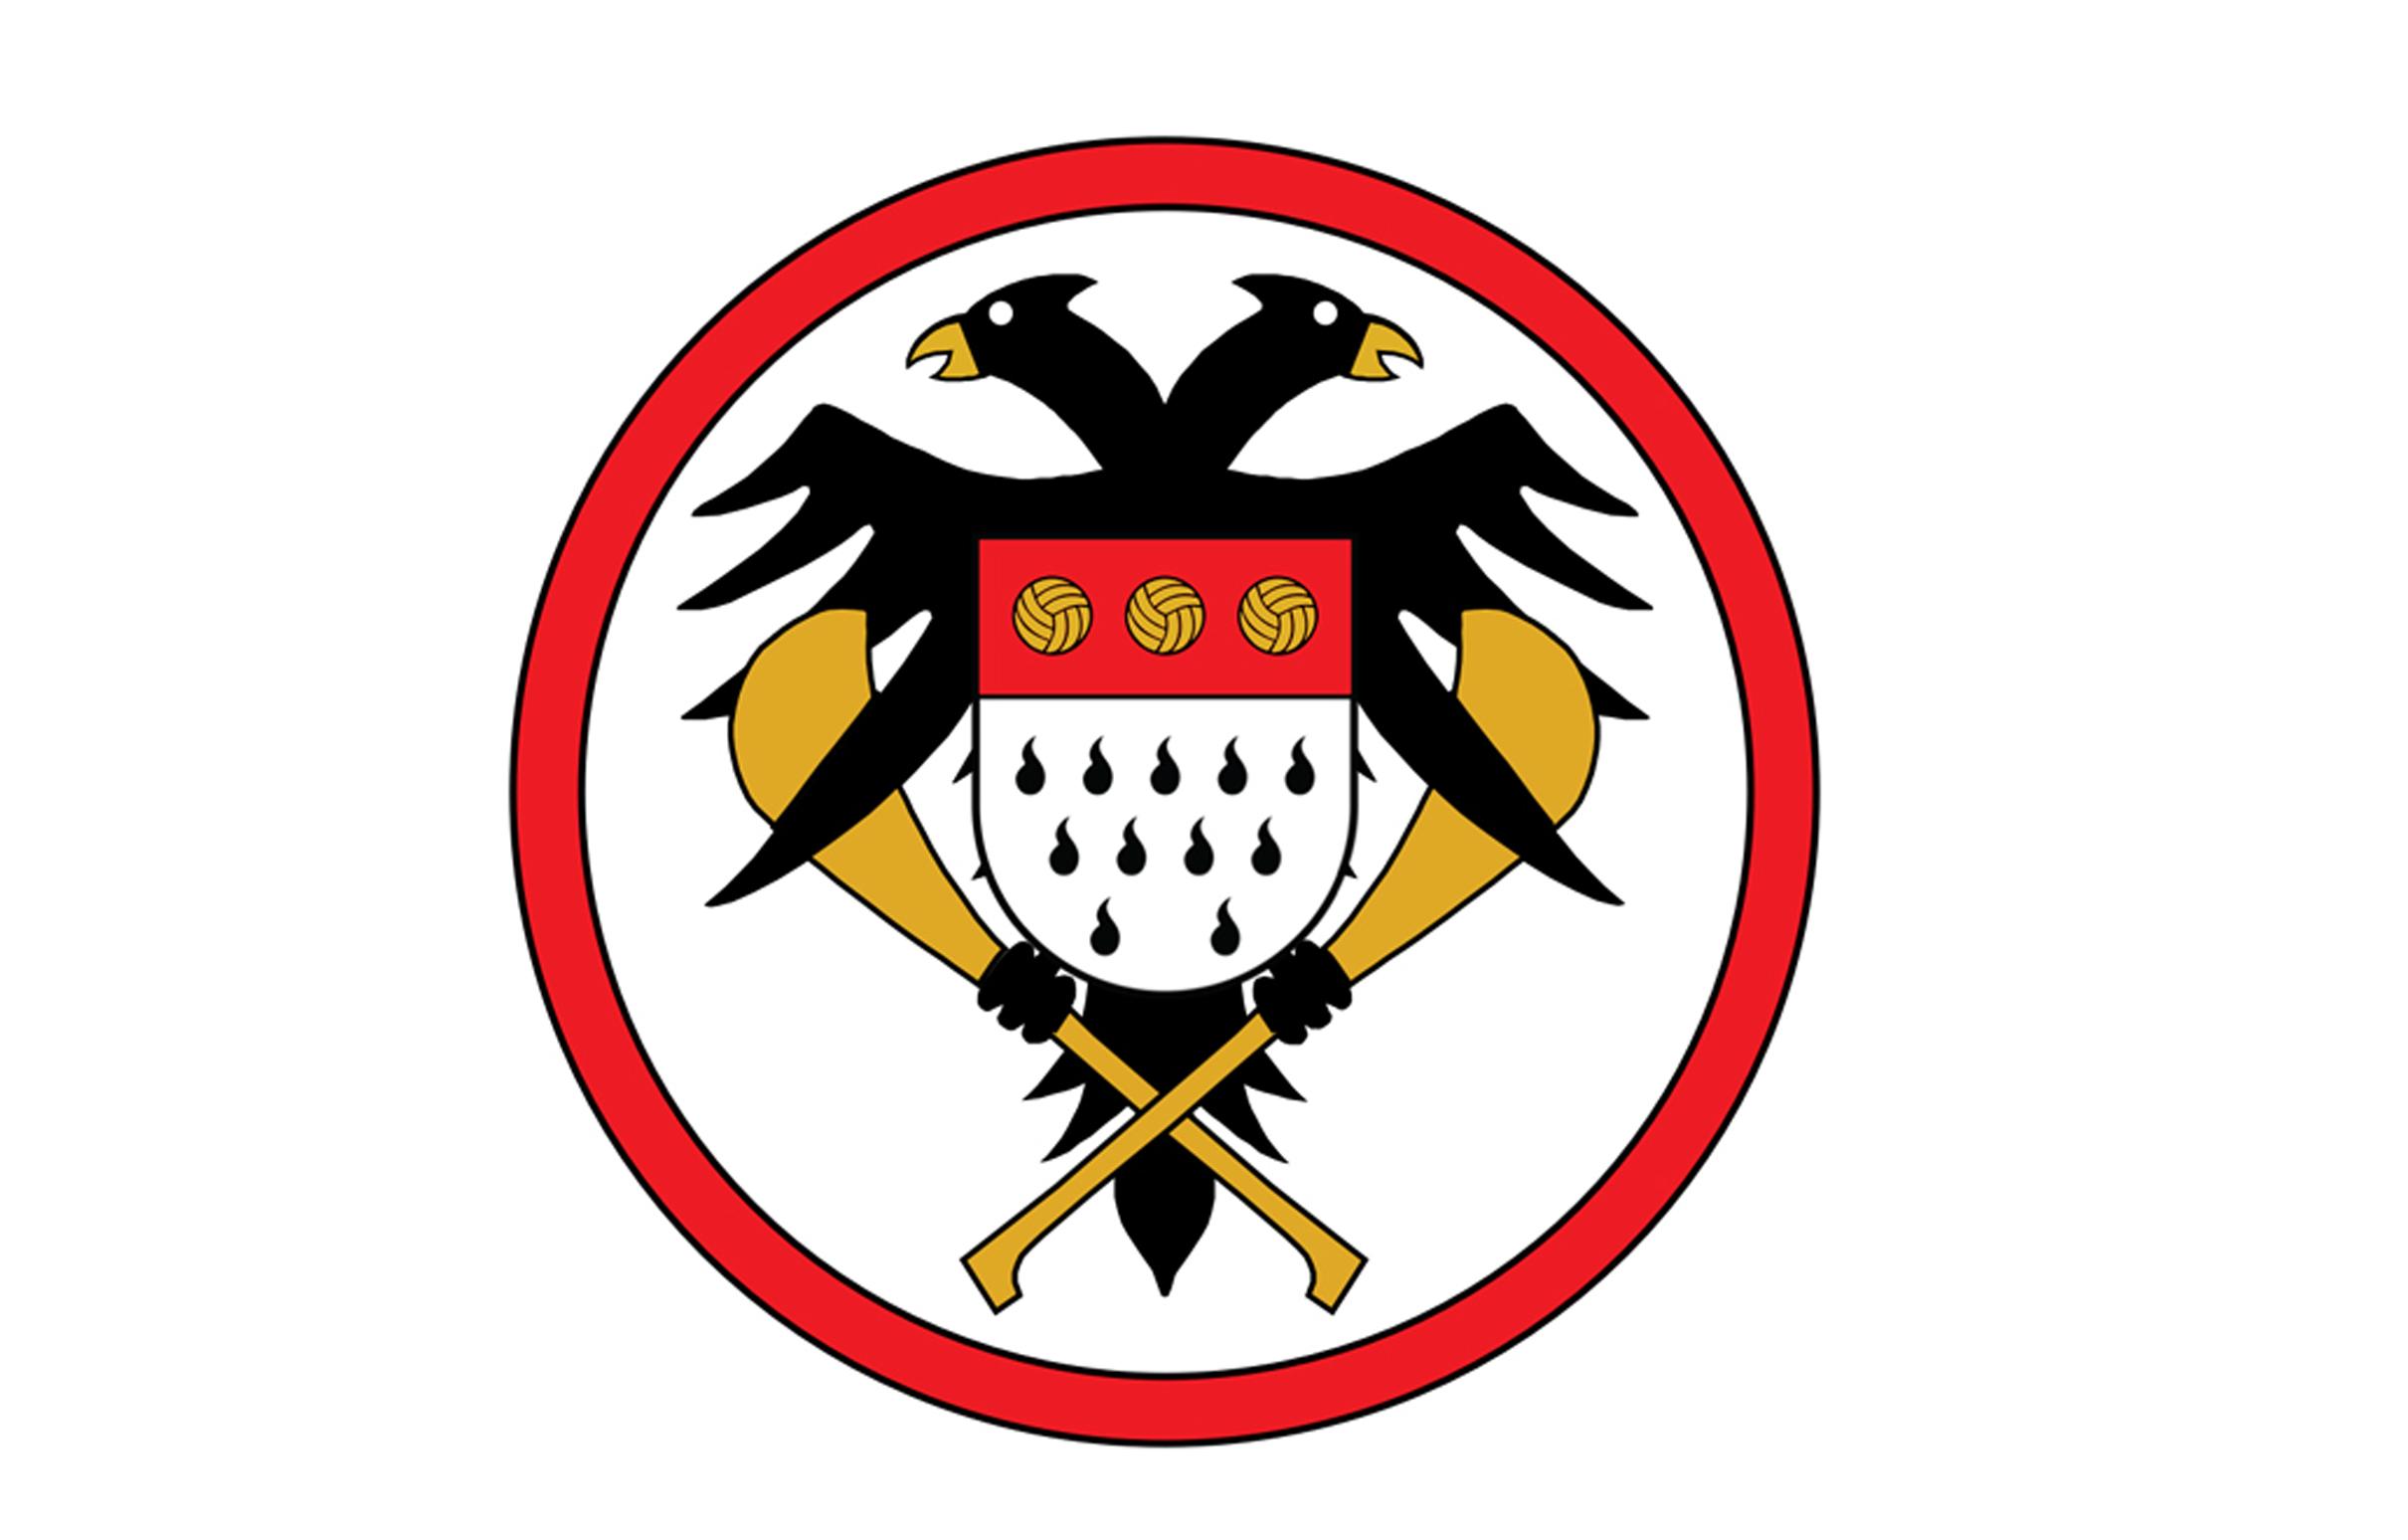 Cologne celtics logo